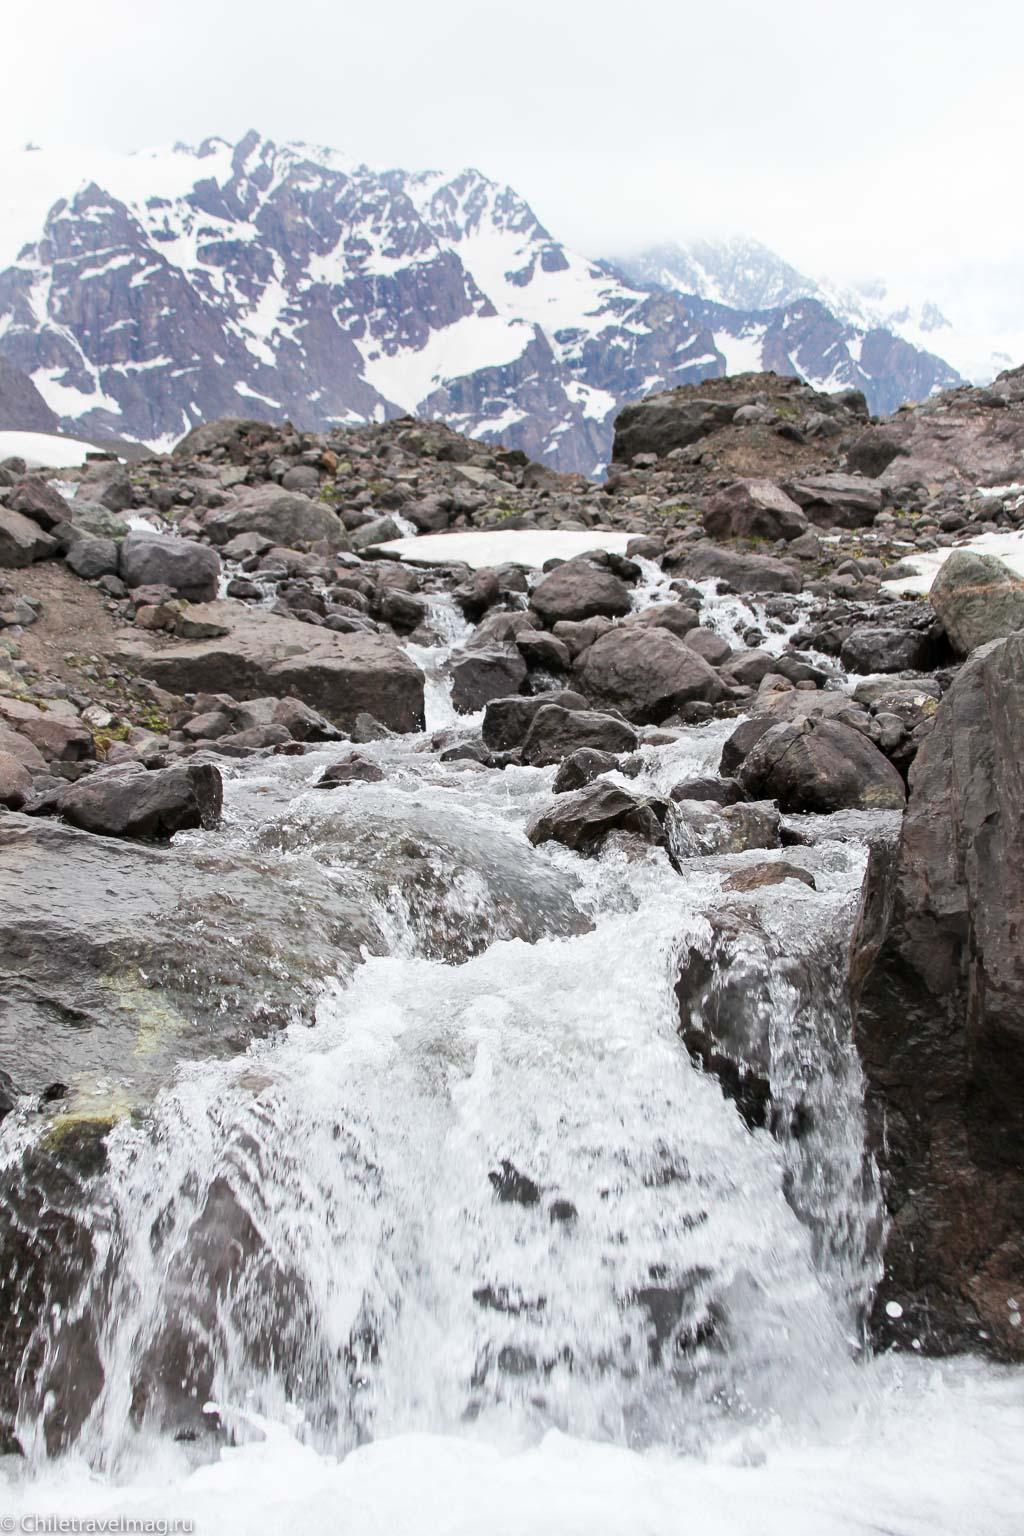 glaciar-el-morado-cajon-del-maipo-chile-%d0%bb%d0%b5%d0%b4%d0%bd%d0%b8%d0%ba%d0%b8-%d1%87%d0%b8%d0%bb%d0%b8-28